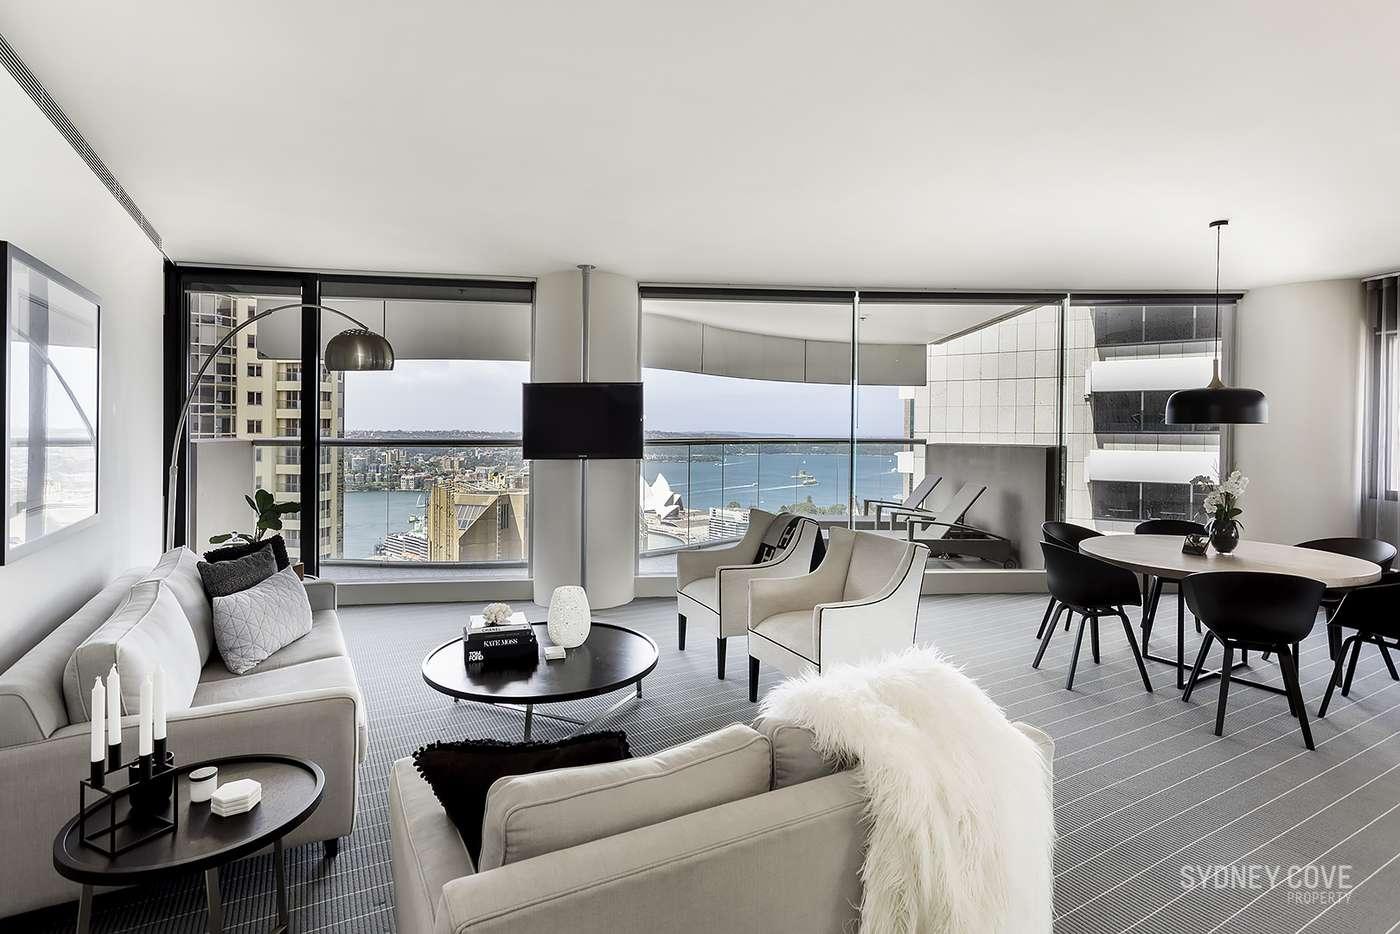 Main view of Homely apartment listing, 129 Harrington Street, Sydney NSW 2000